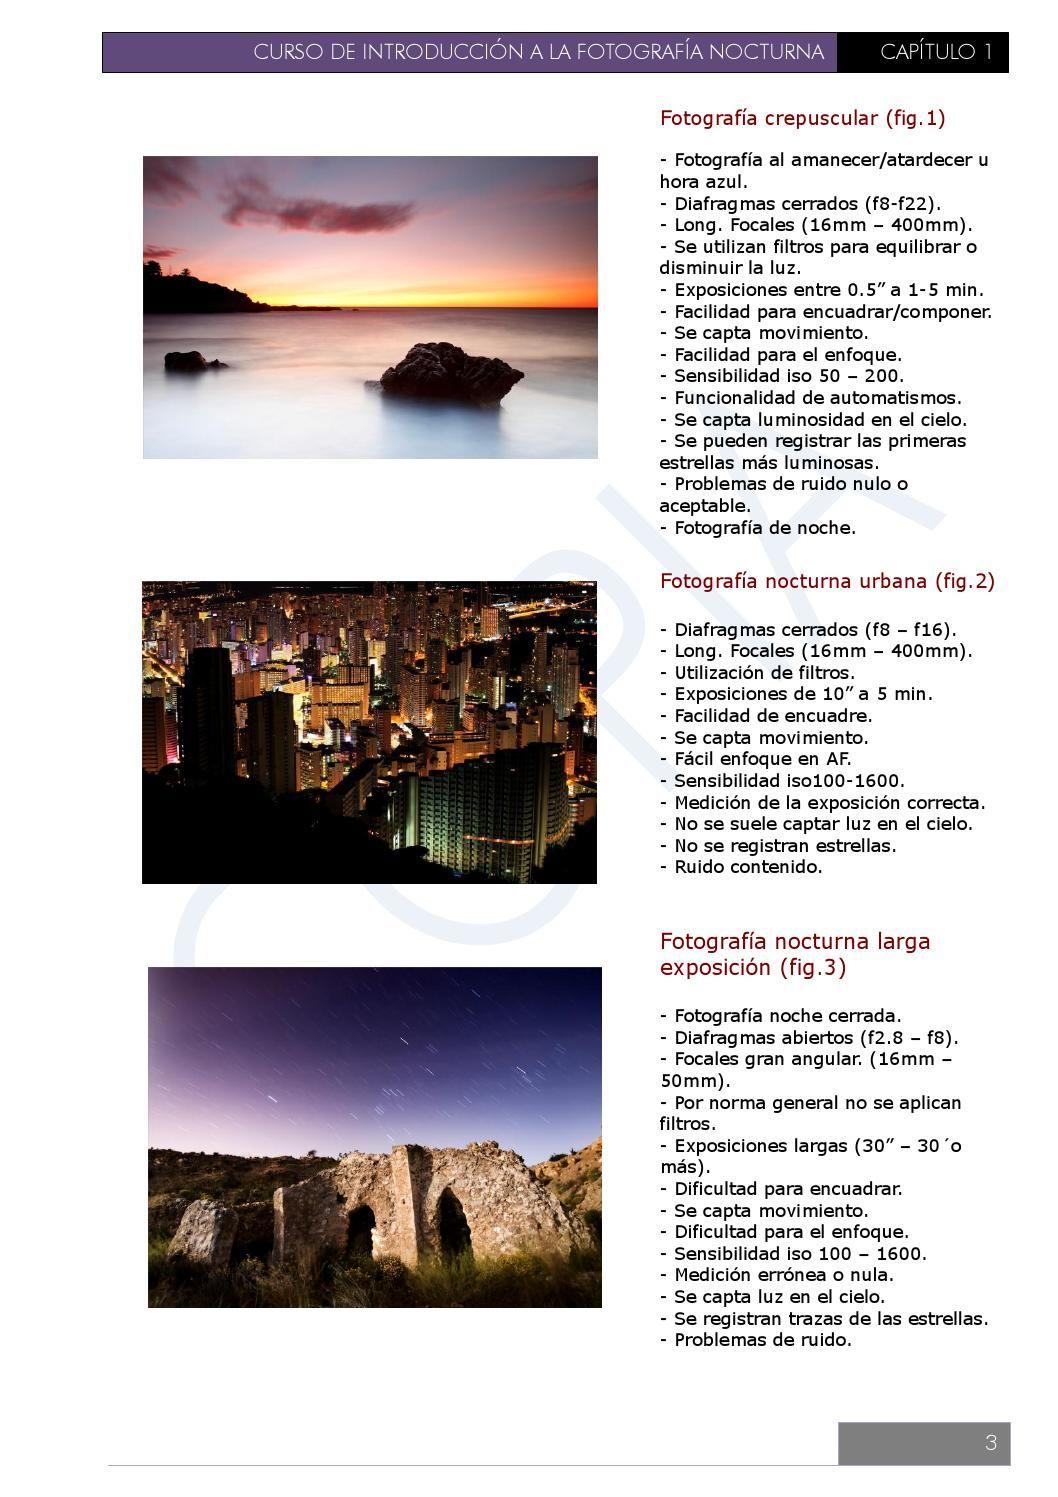 Introduccion a la fotografia nocturna | Fotografía